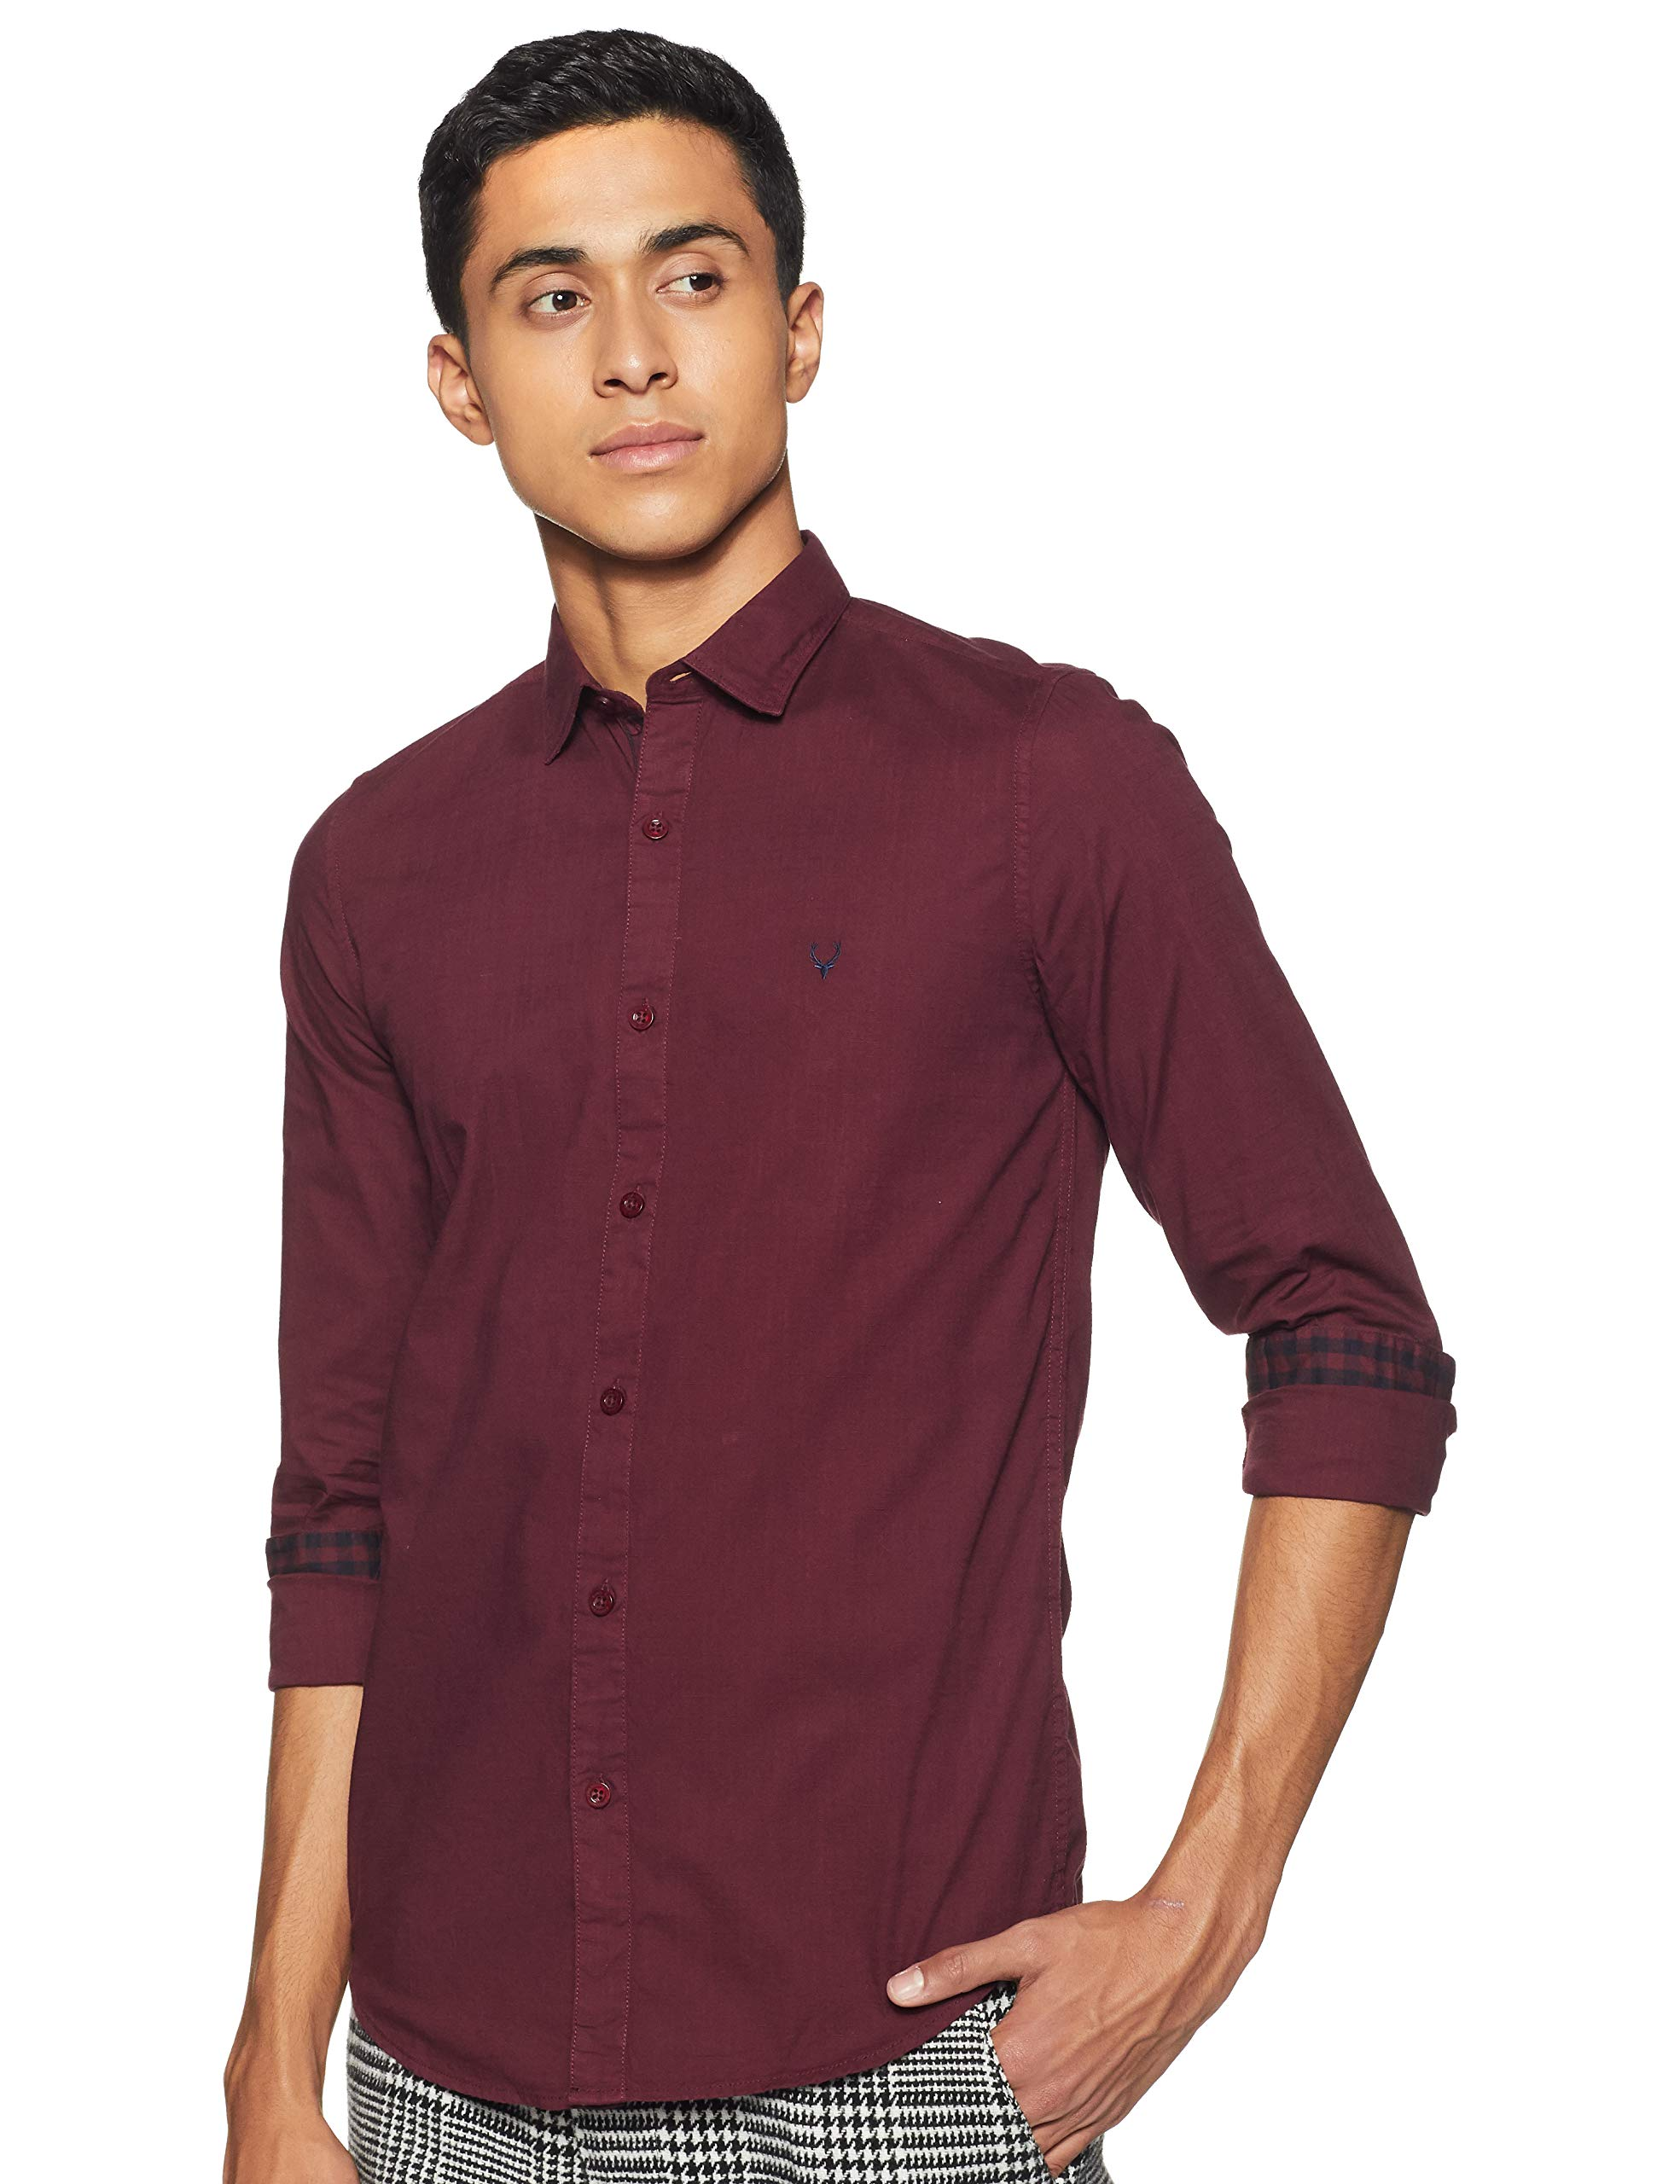 Allen Solly Men's Plain Slim Fit Casual Shirt (B07DMYHRPP) Amazon Price History, Amazon Price Tracker